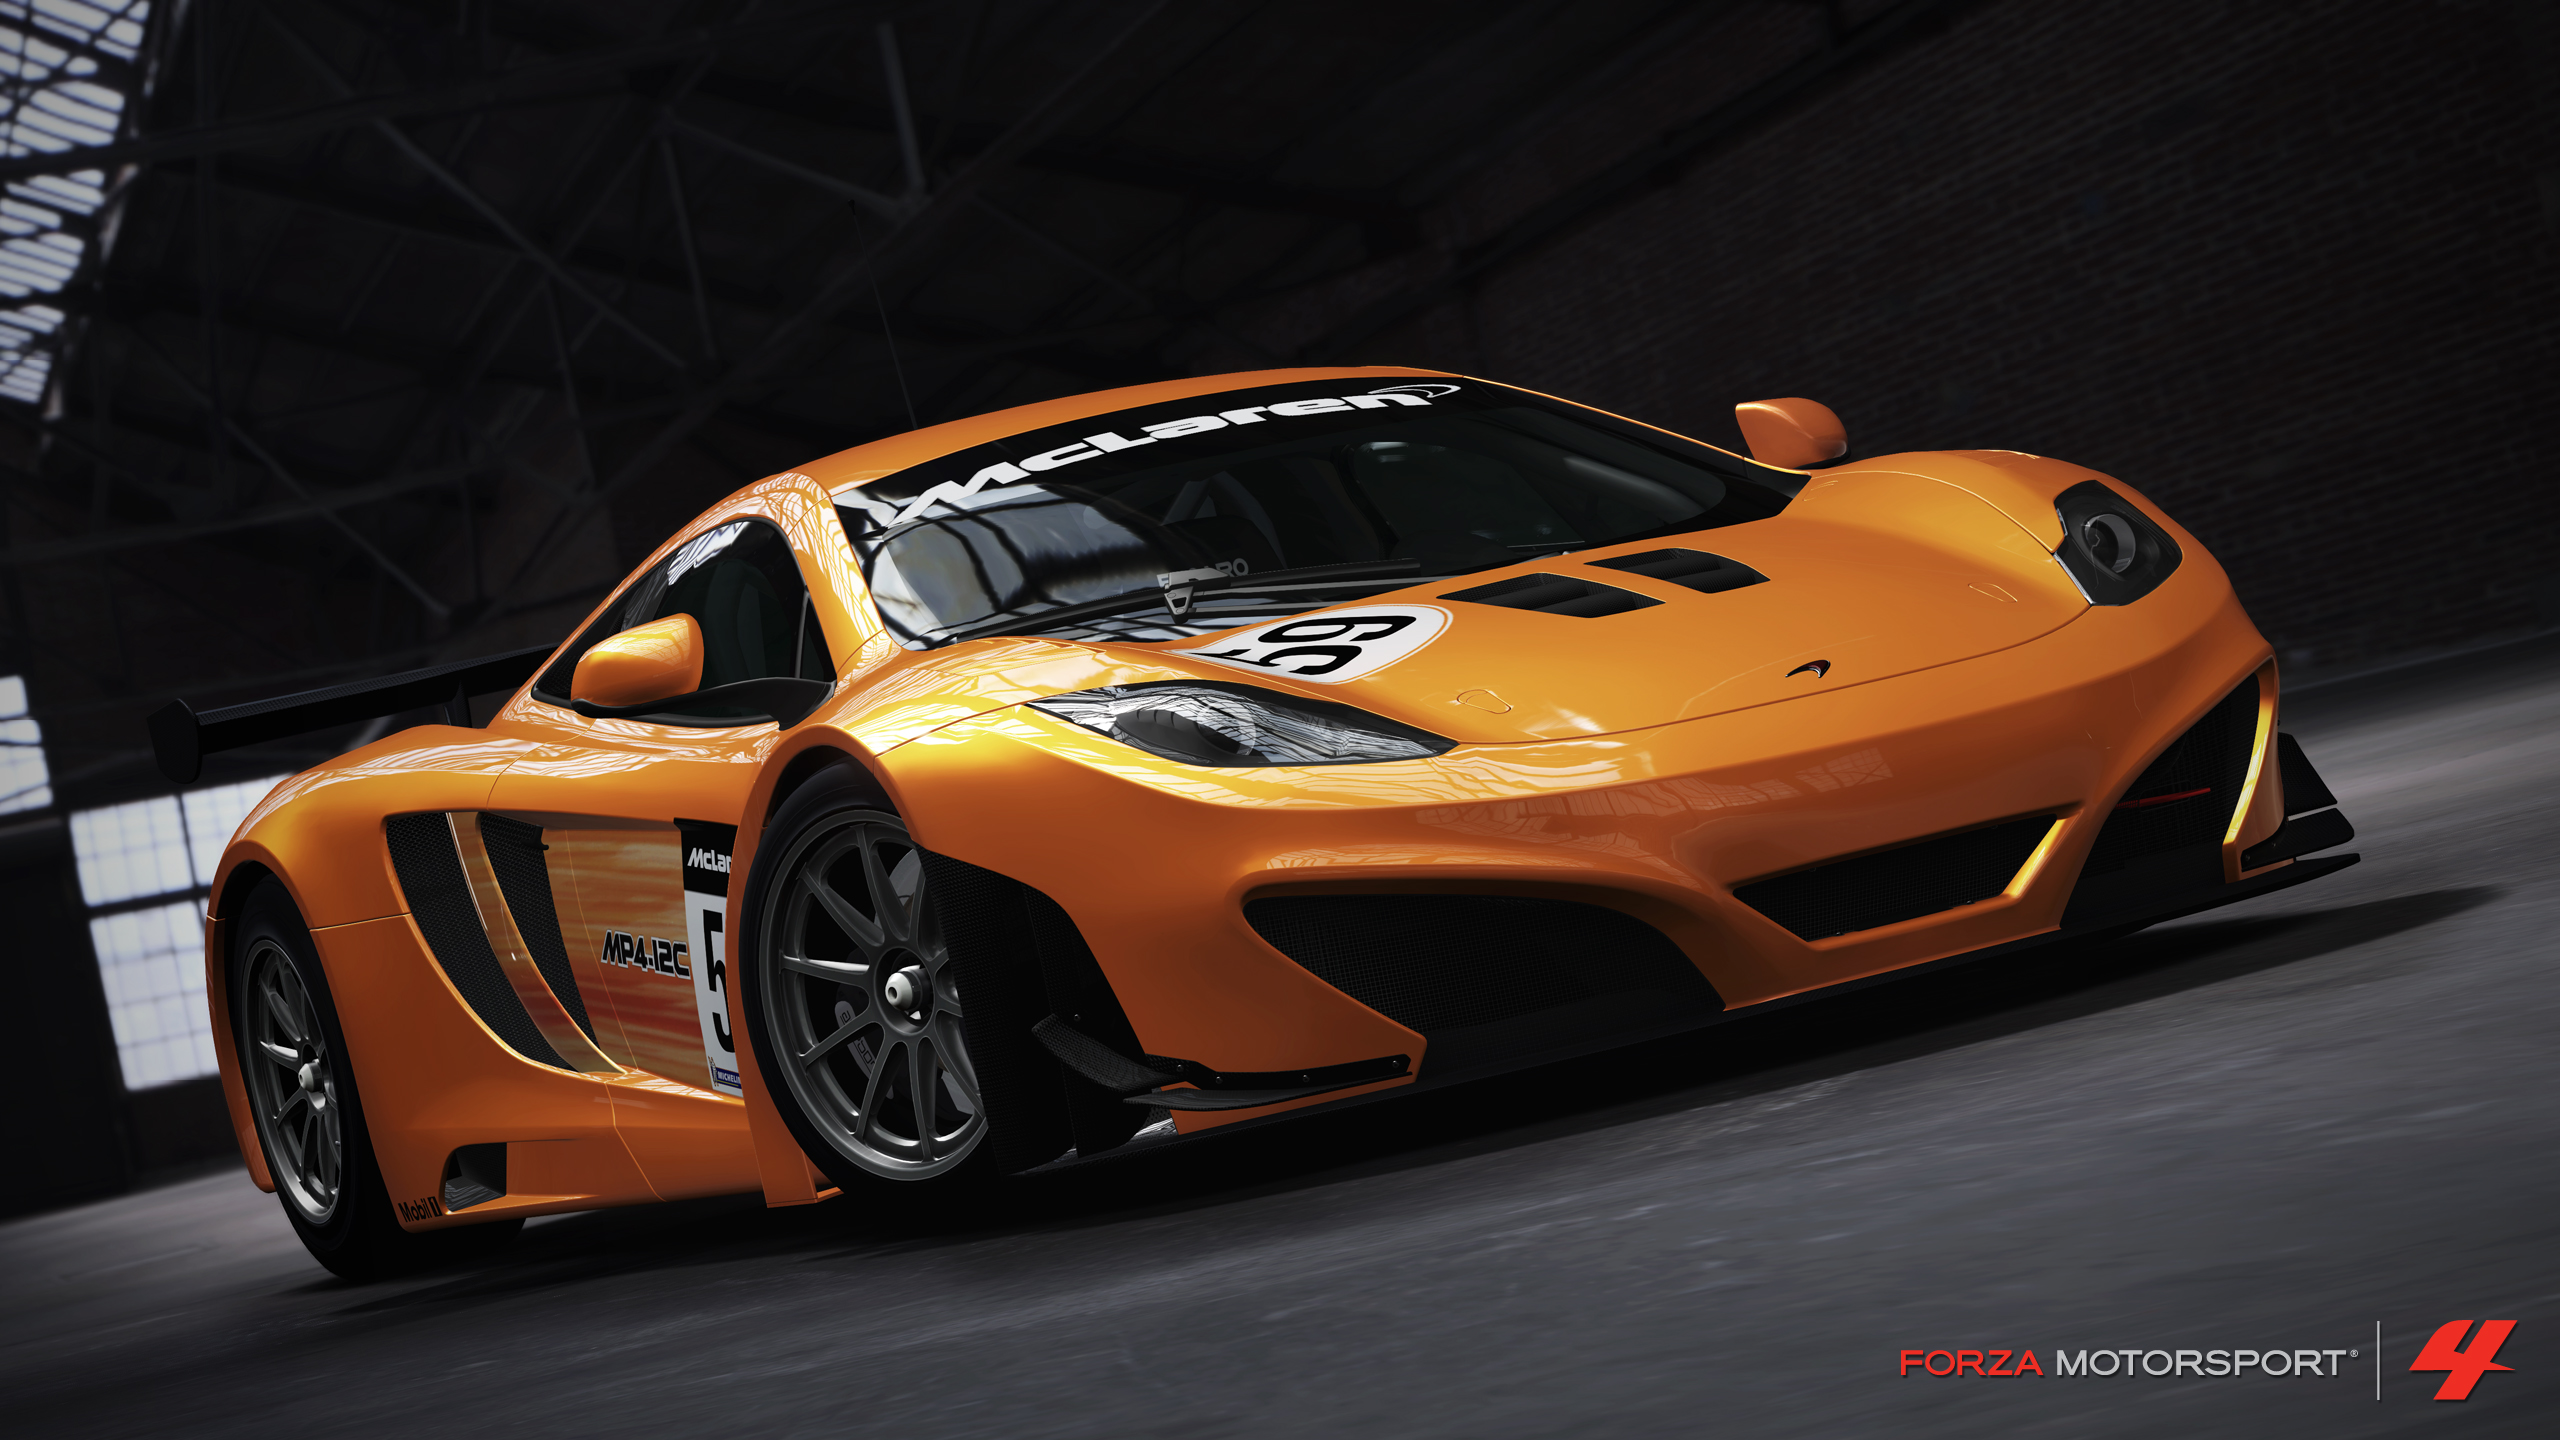 Forza Motorsport 4/July Car Pack